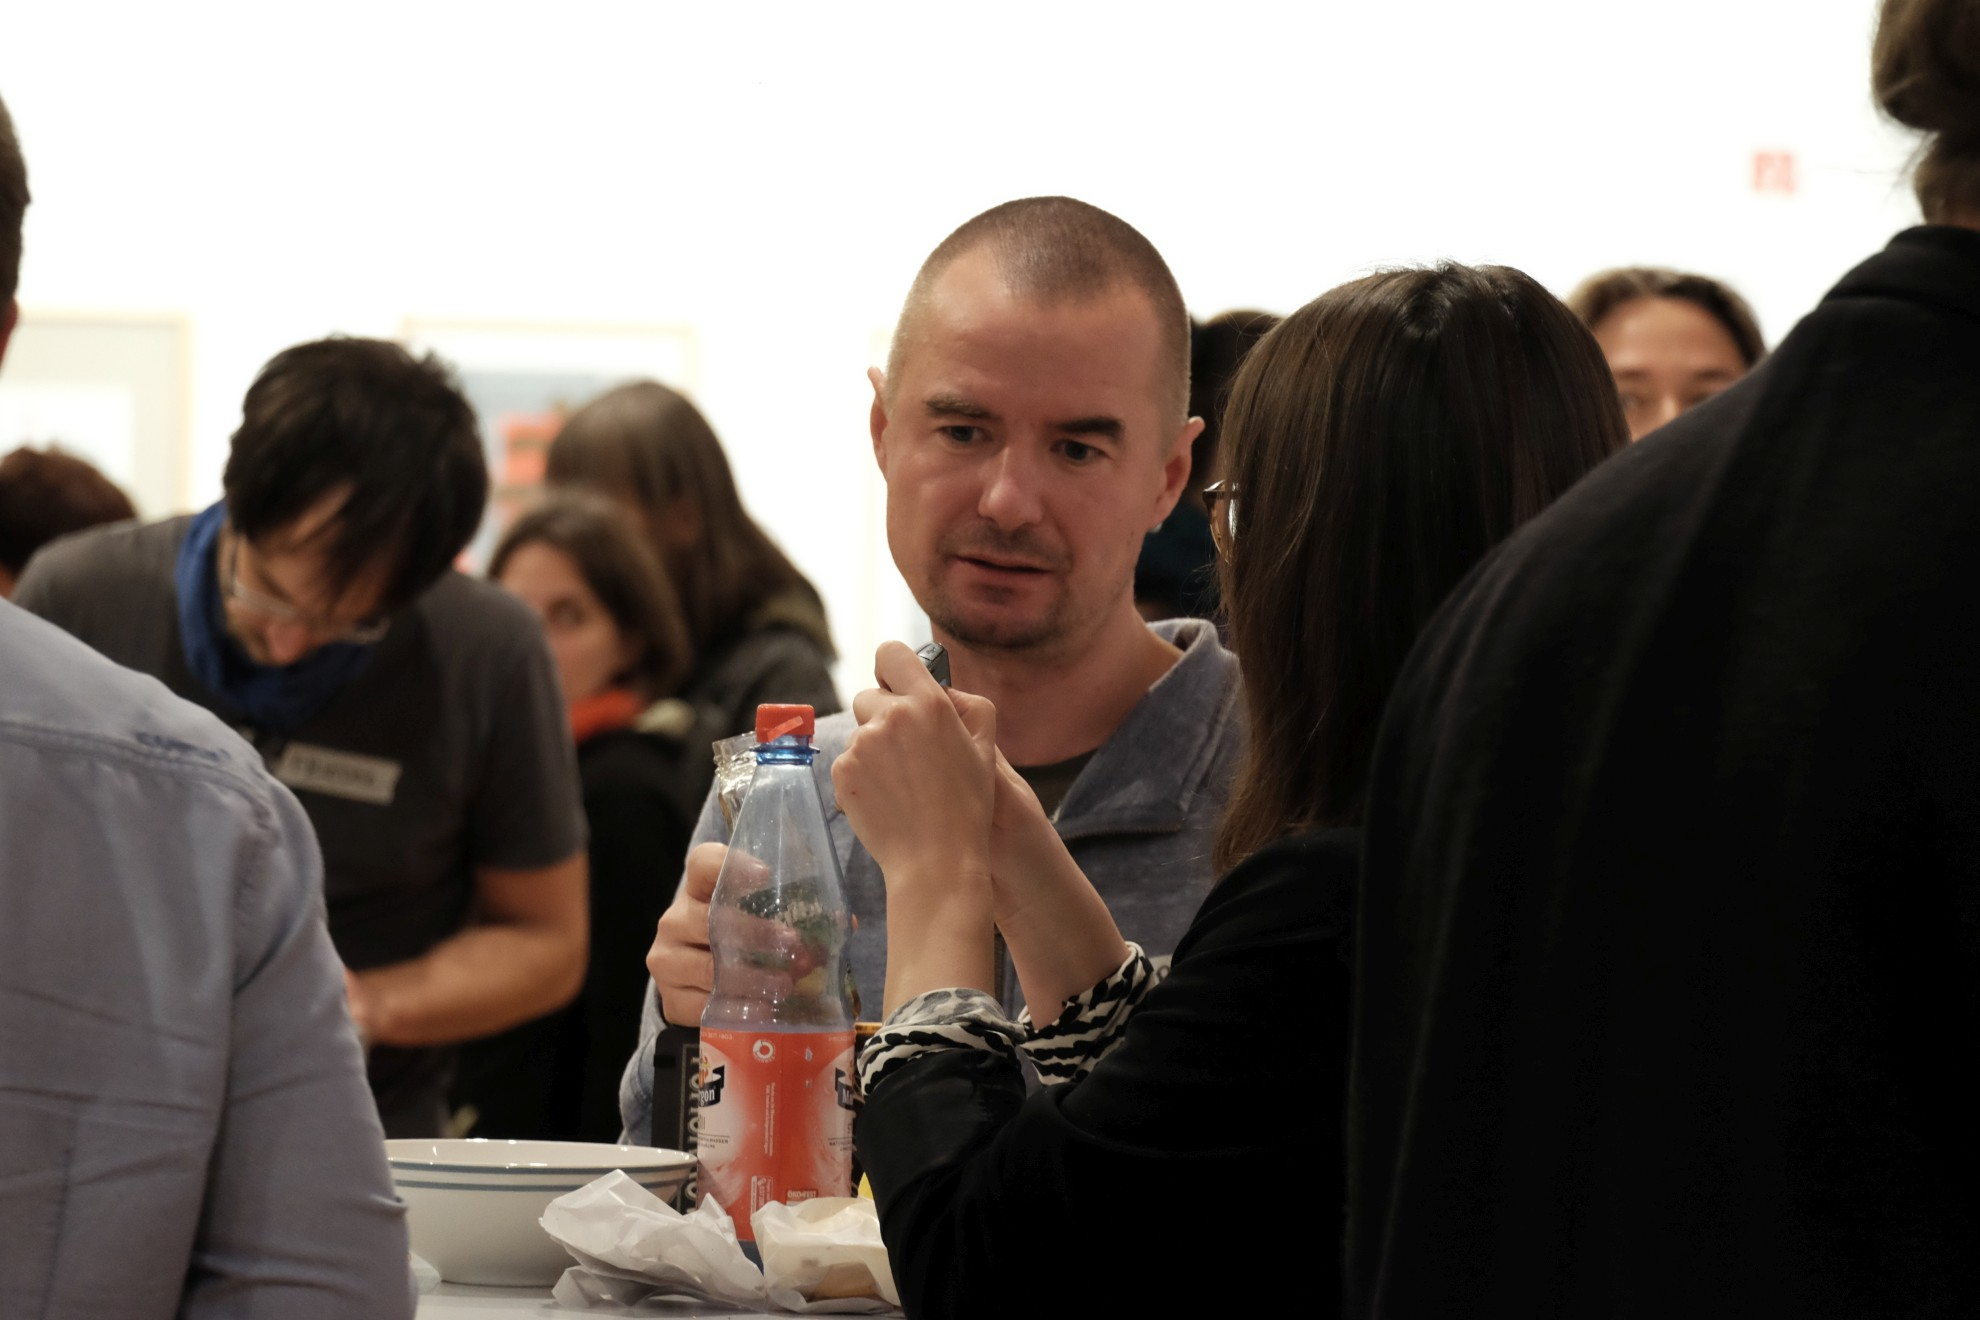 Norbert Rost beim Zukunftsstadt Dresden Workshop X am 5.12.2017. (Foto: Katrin Stephan)